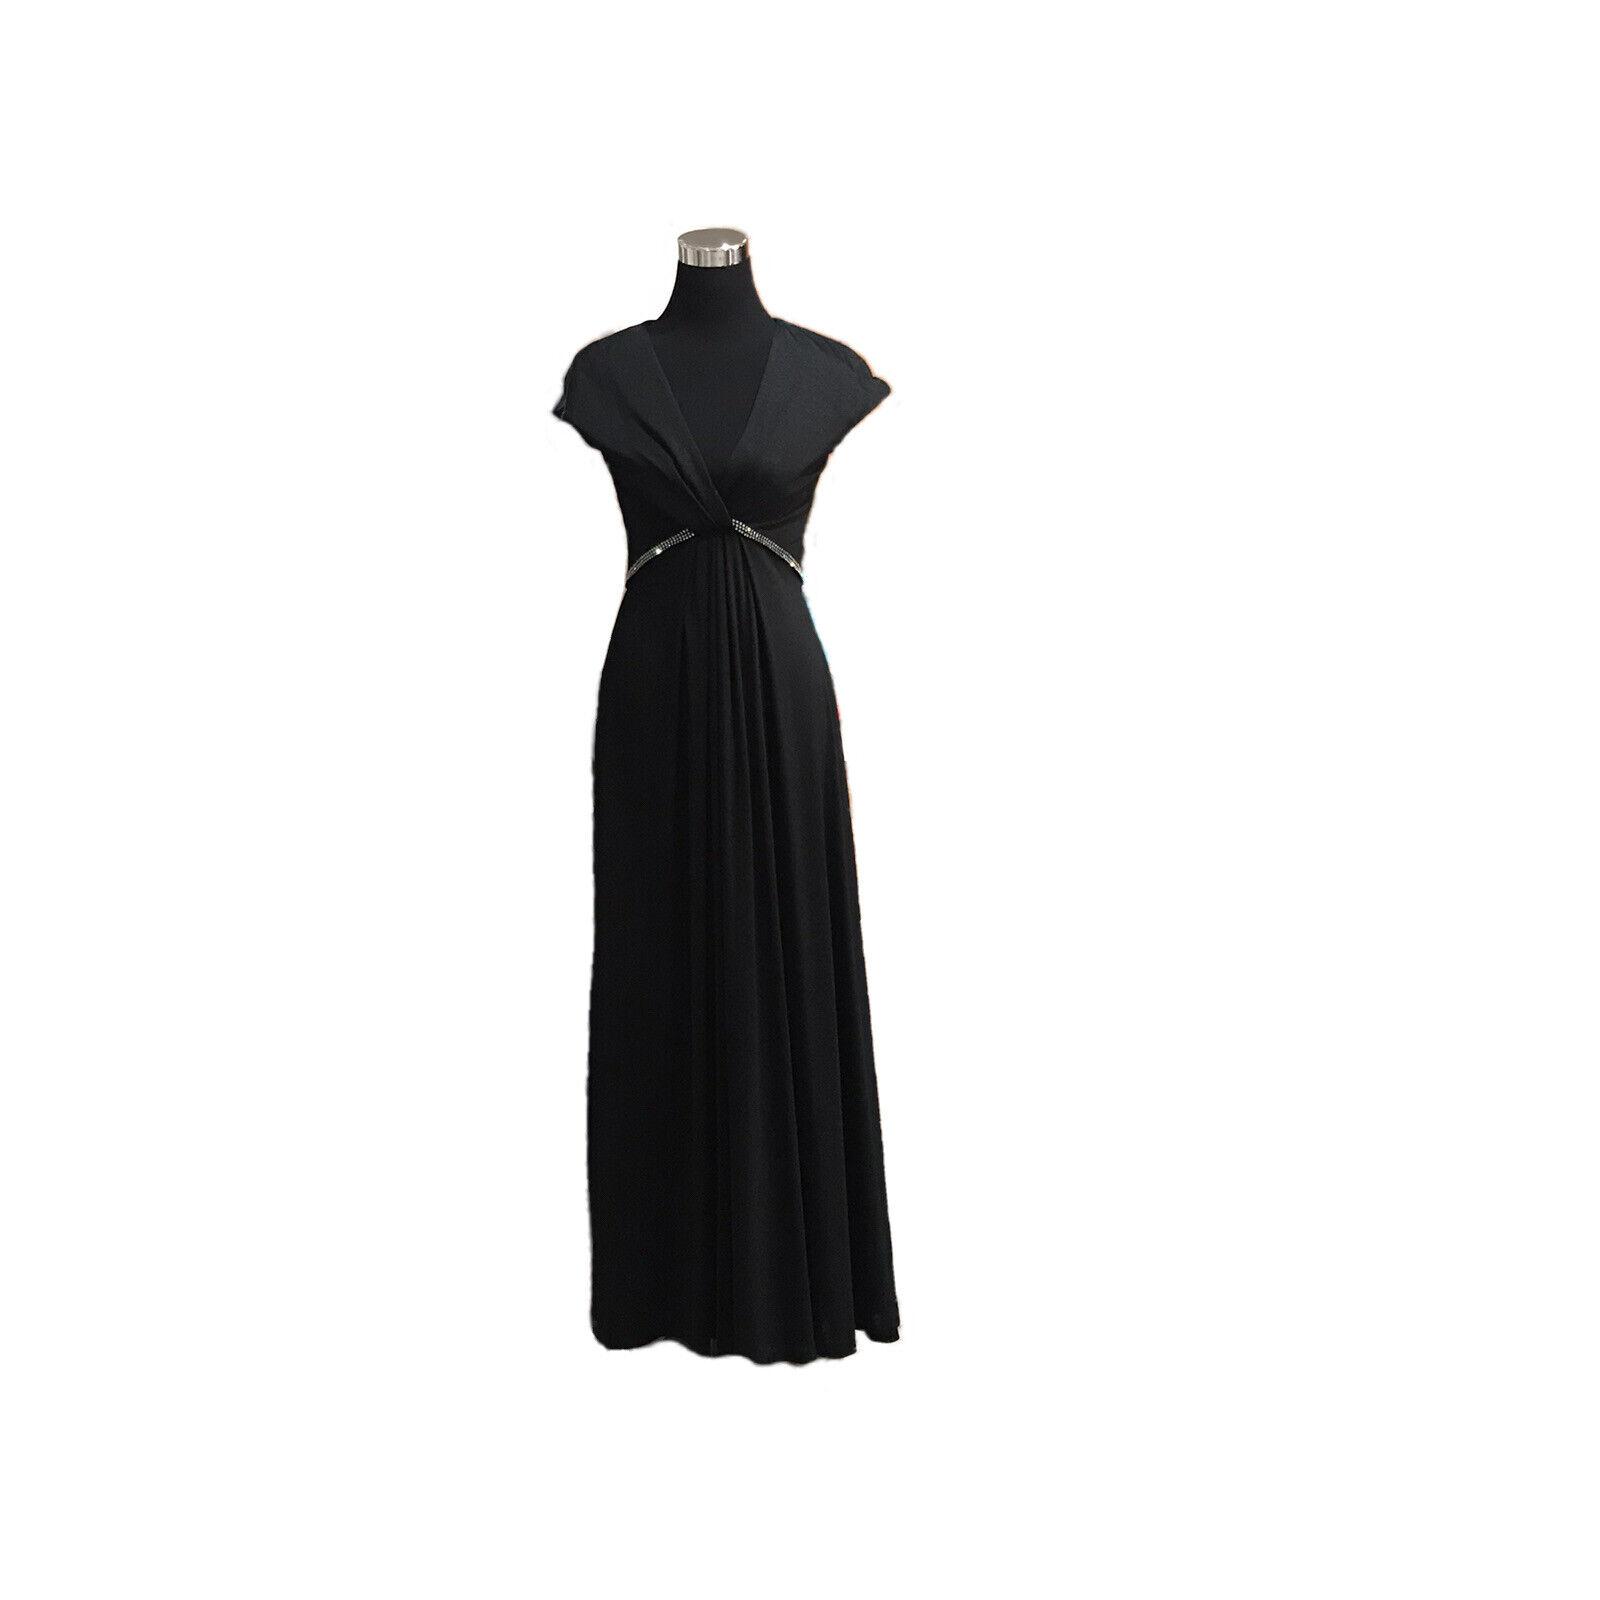 Vintage Luis Estevez Dress Eva Gabor Look Label B… - image 12